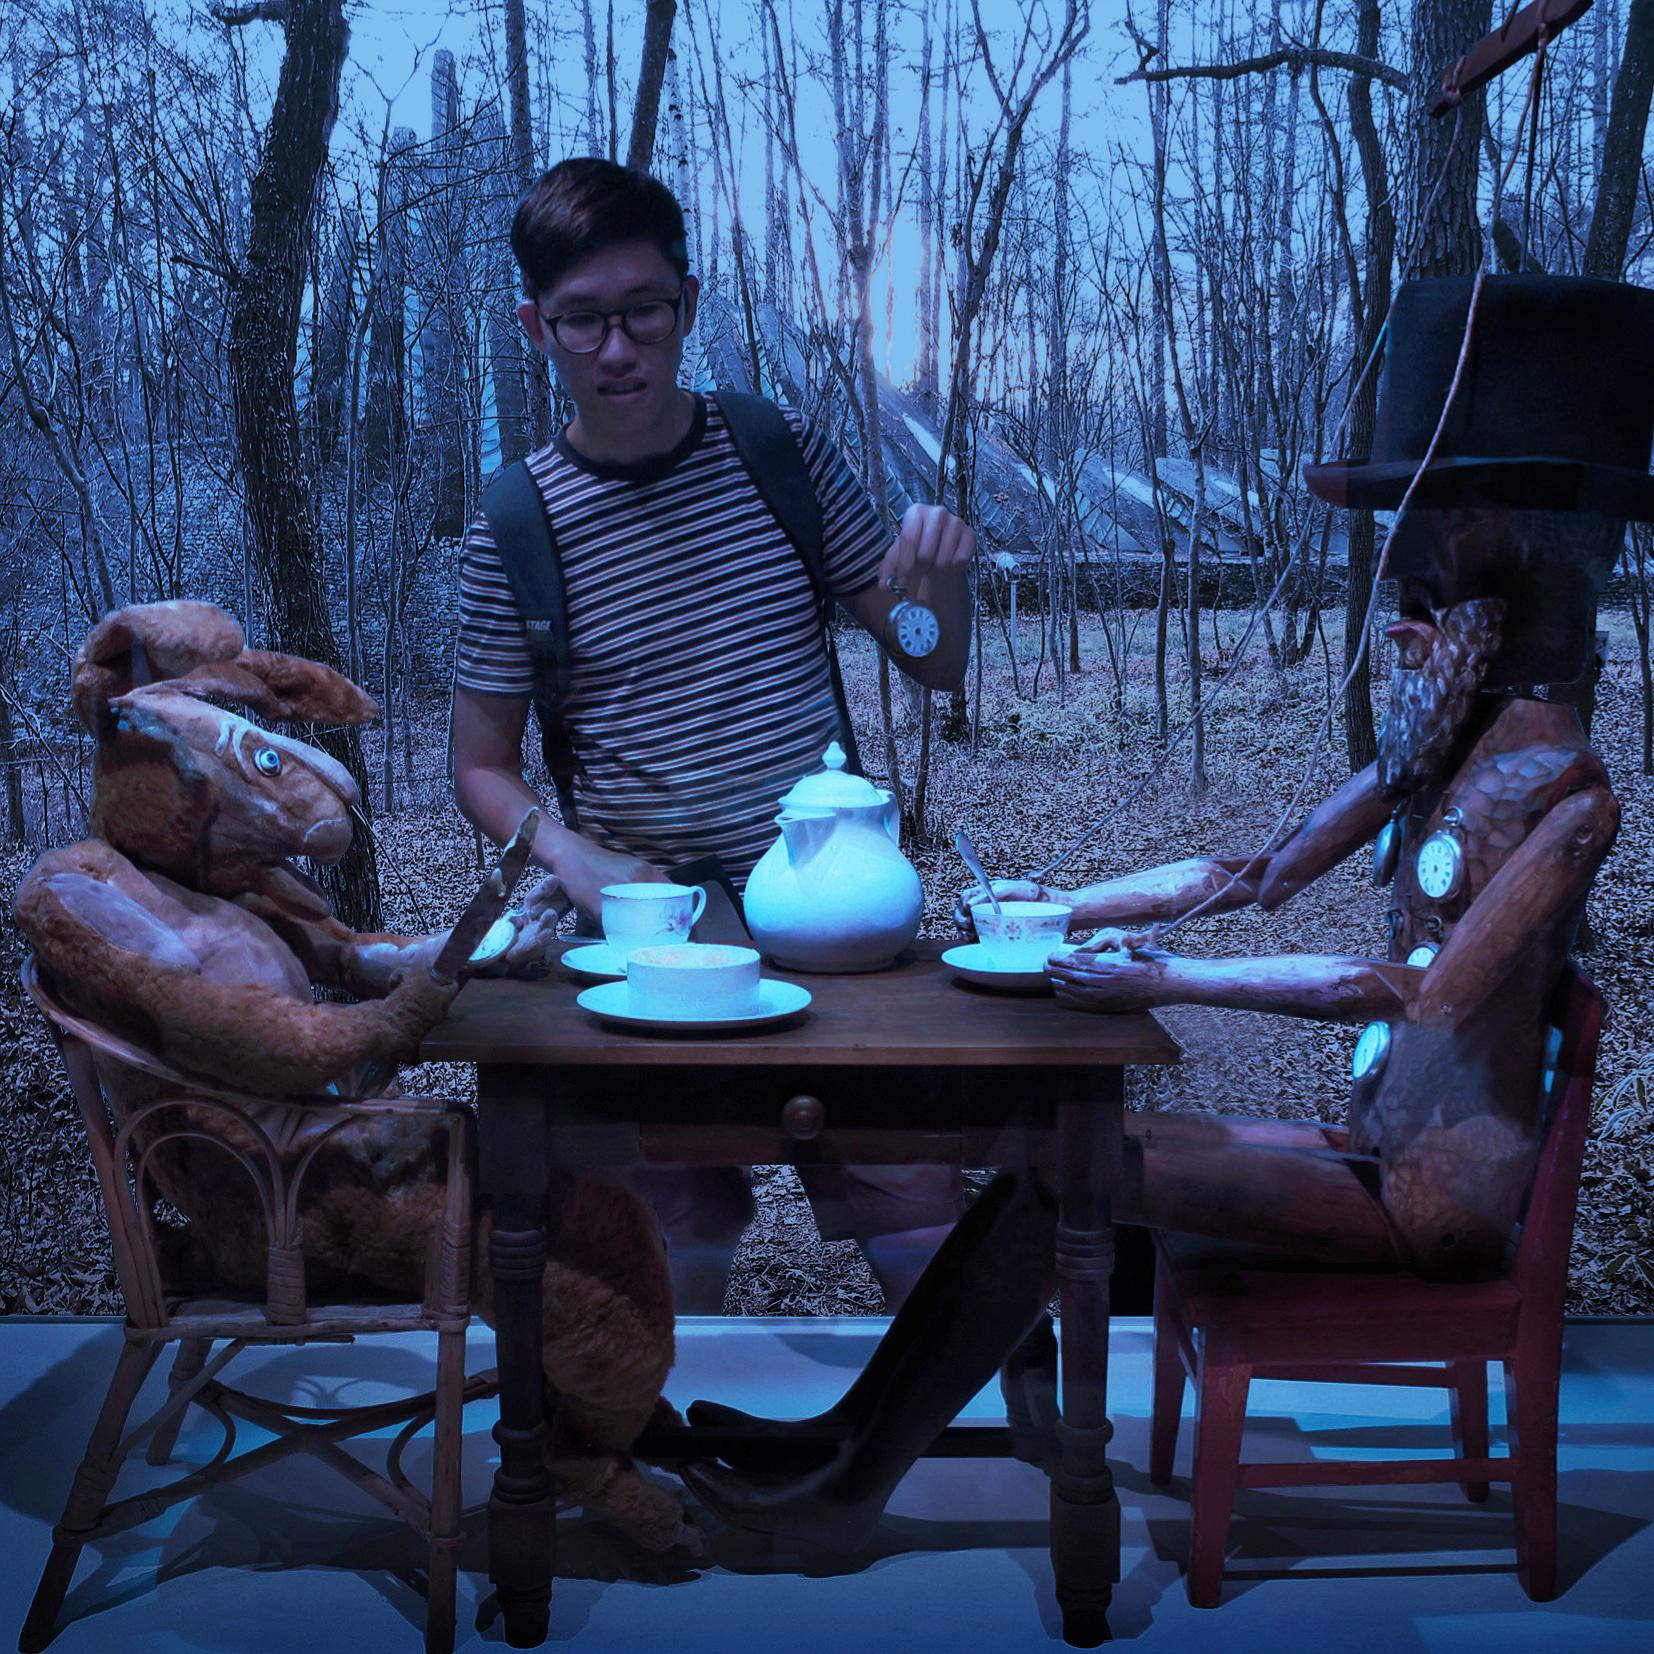 Tea Party Digital Art by Alvin Sim